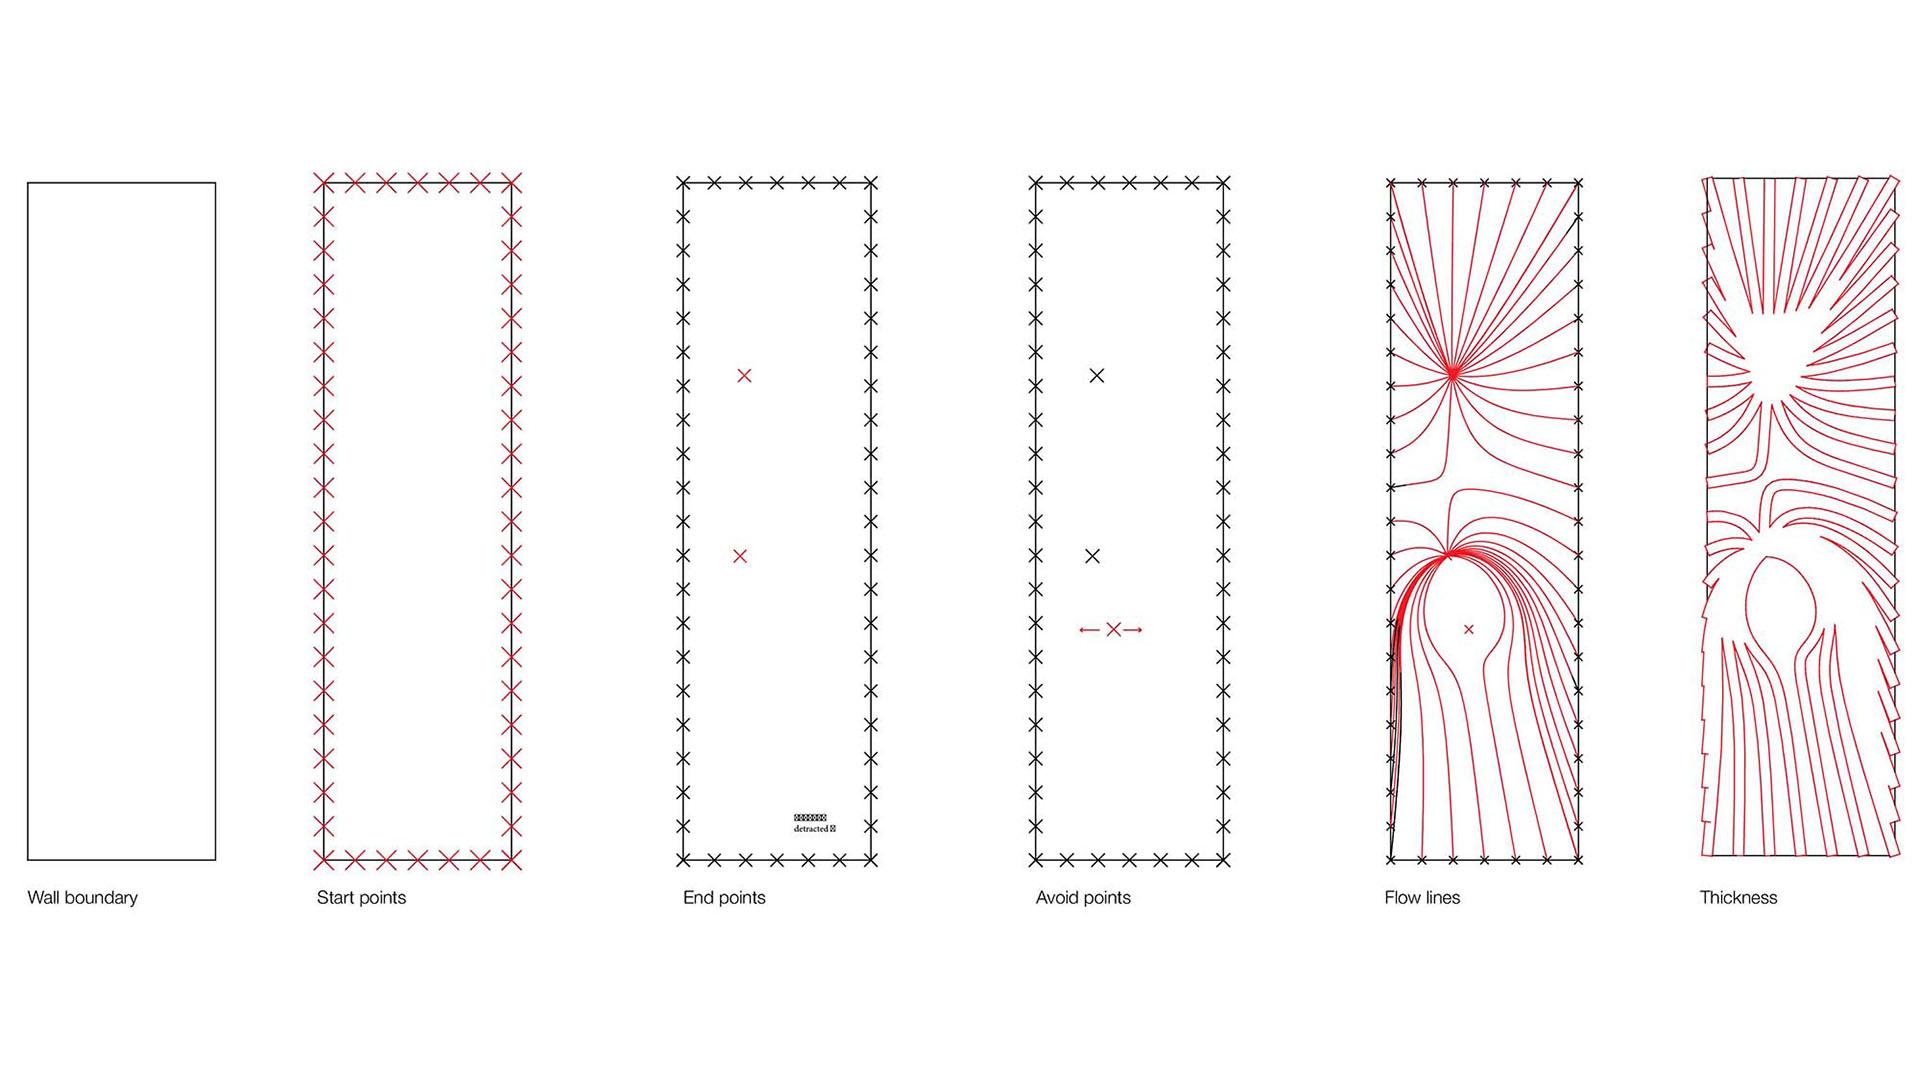 EarthCastPavilion_Diagram_Wall.jpg